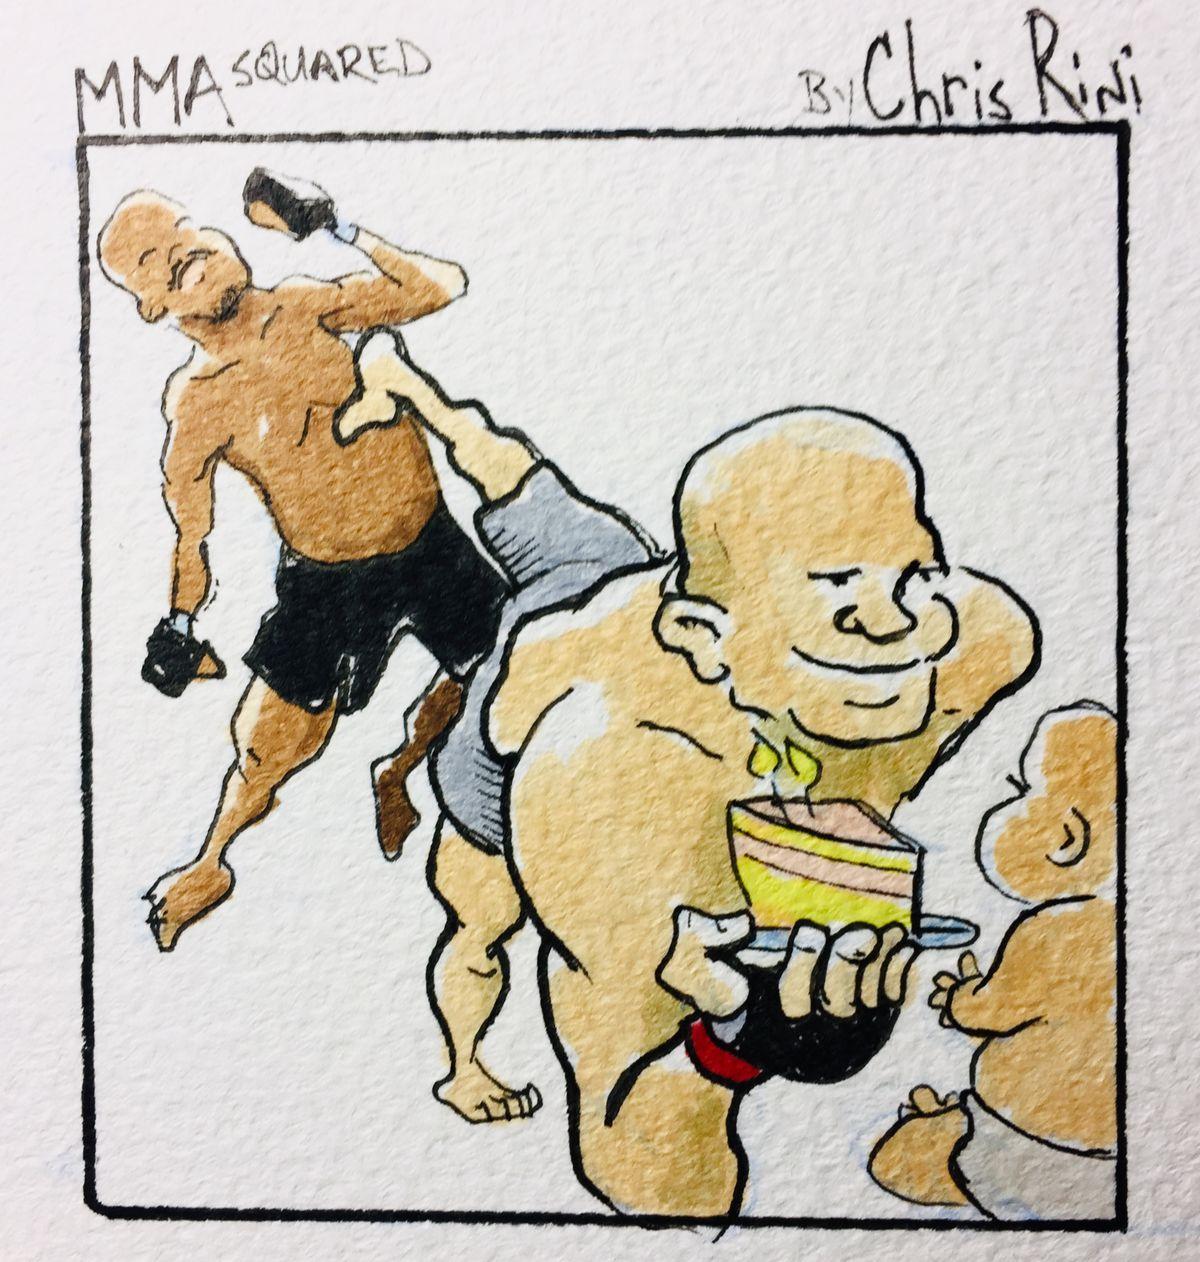 MMA Squared, Chris Rini, Junior dos Santos, JDS, Francis Ngannou, heavyweight,